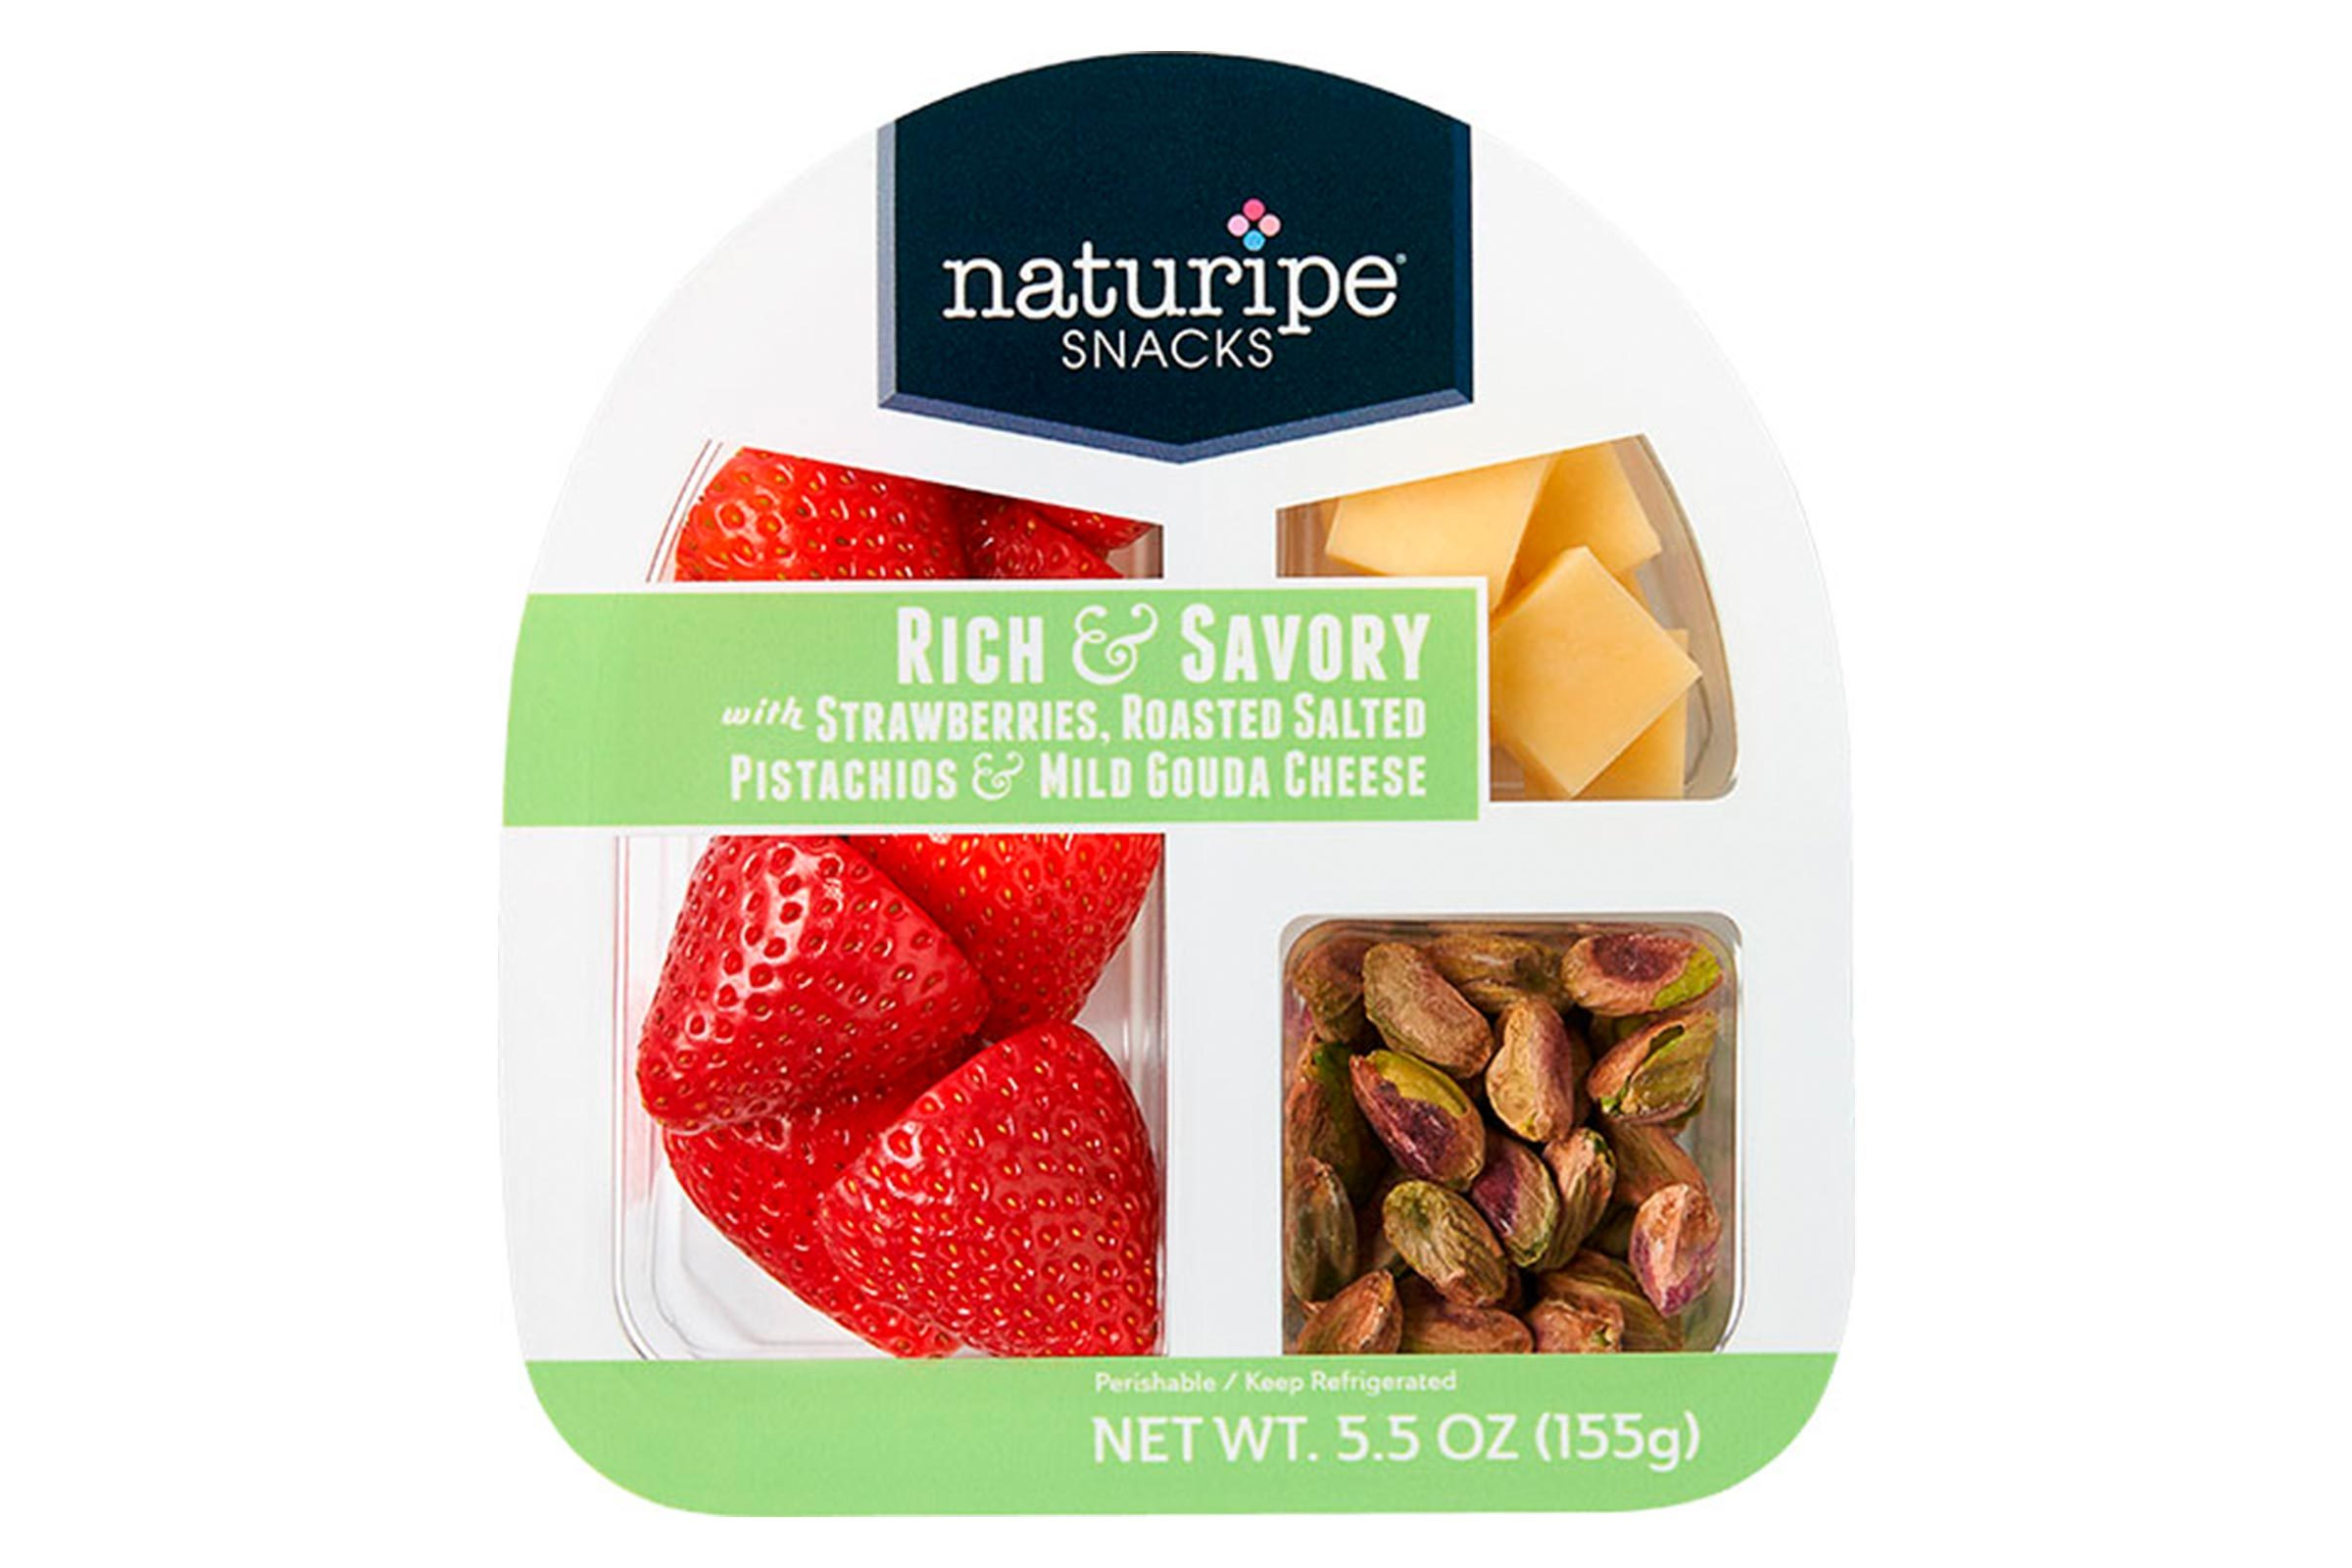 Naturipe snacks